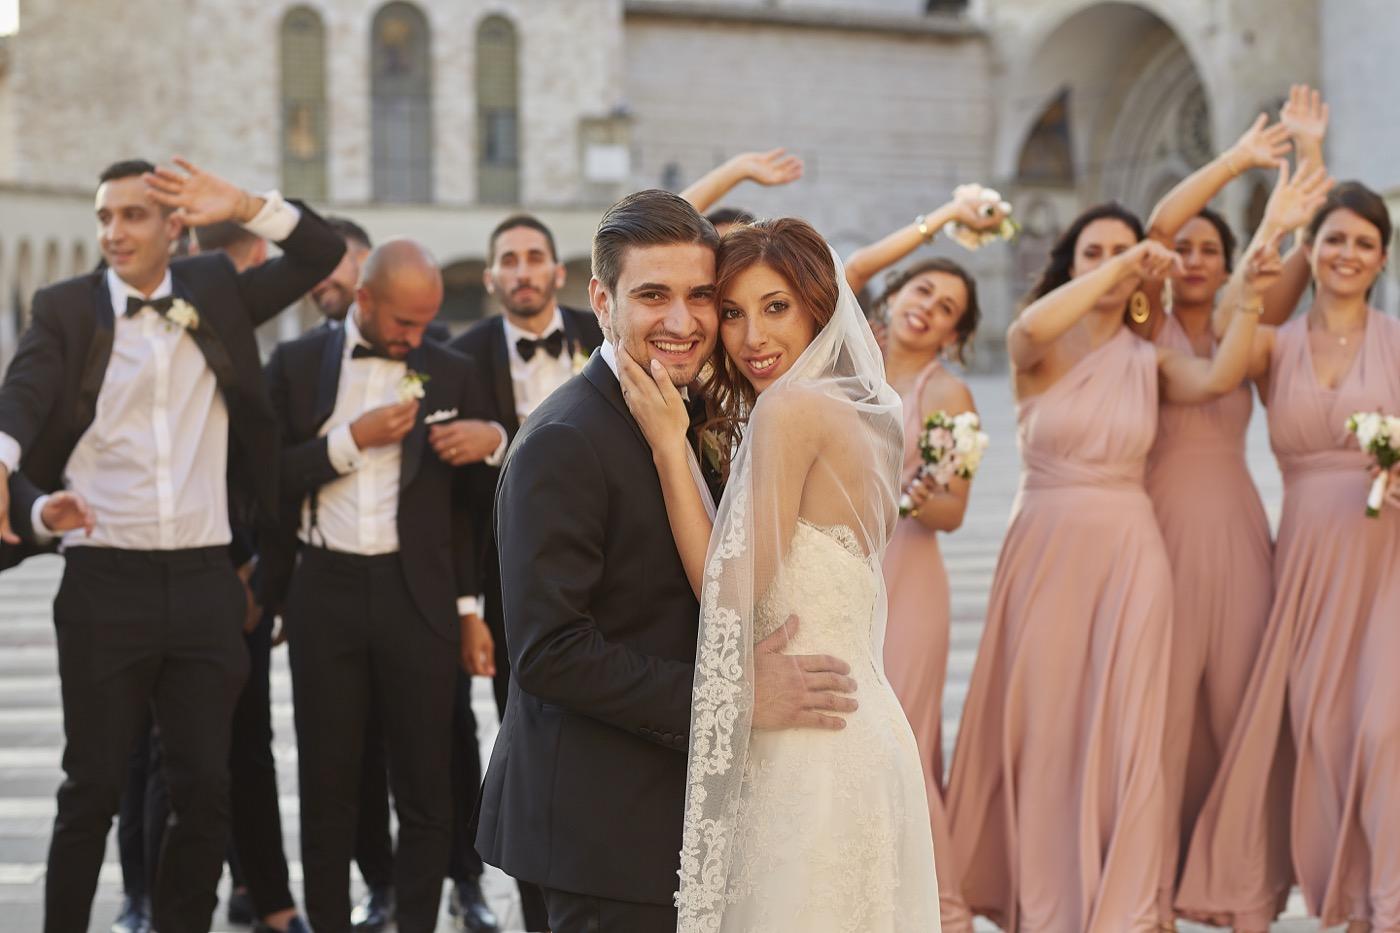 Claudio-Coppola-wedding-photographer-abbazia-7-frati-piegaro-78